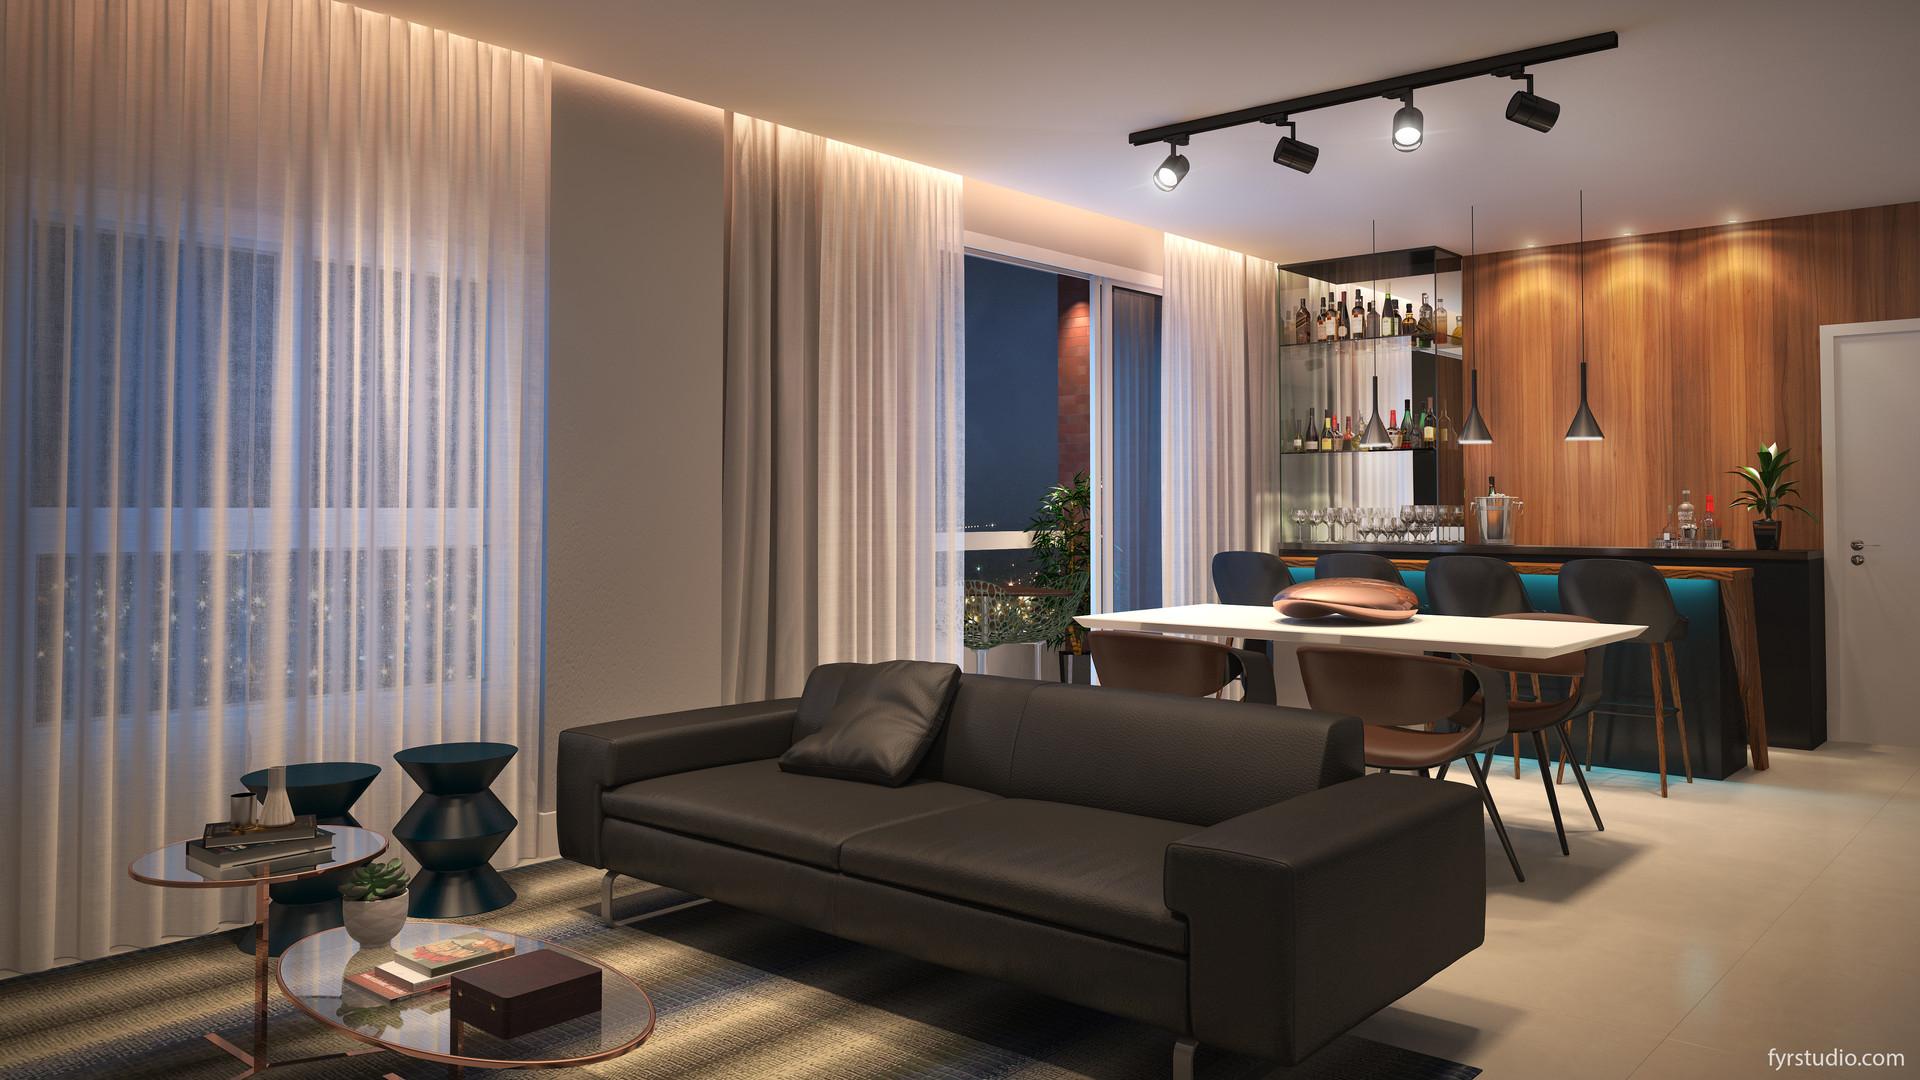 FyrStudio-Construtora Elite-Colombo-Sala